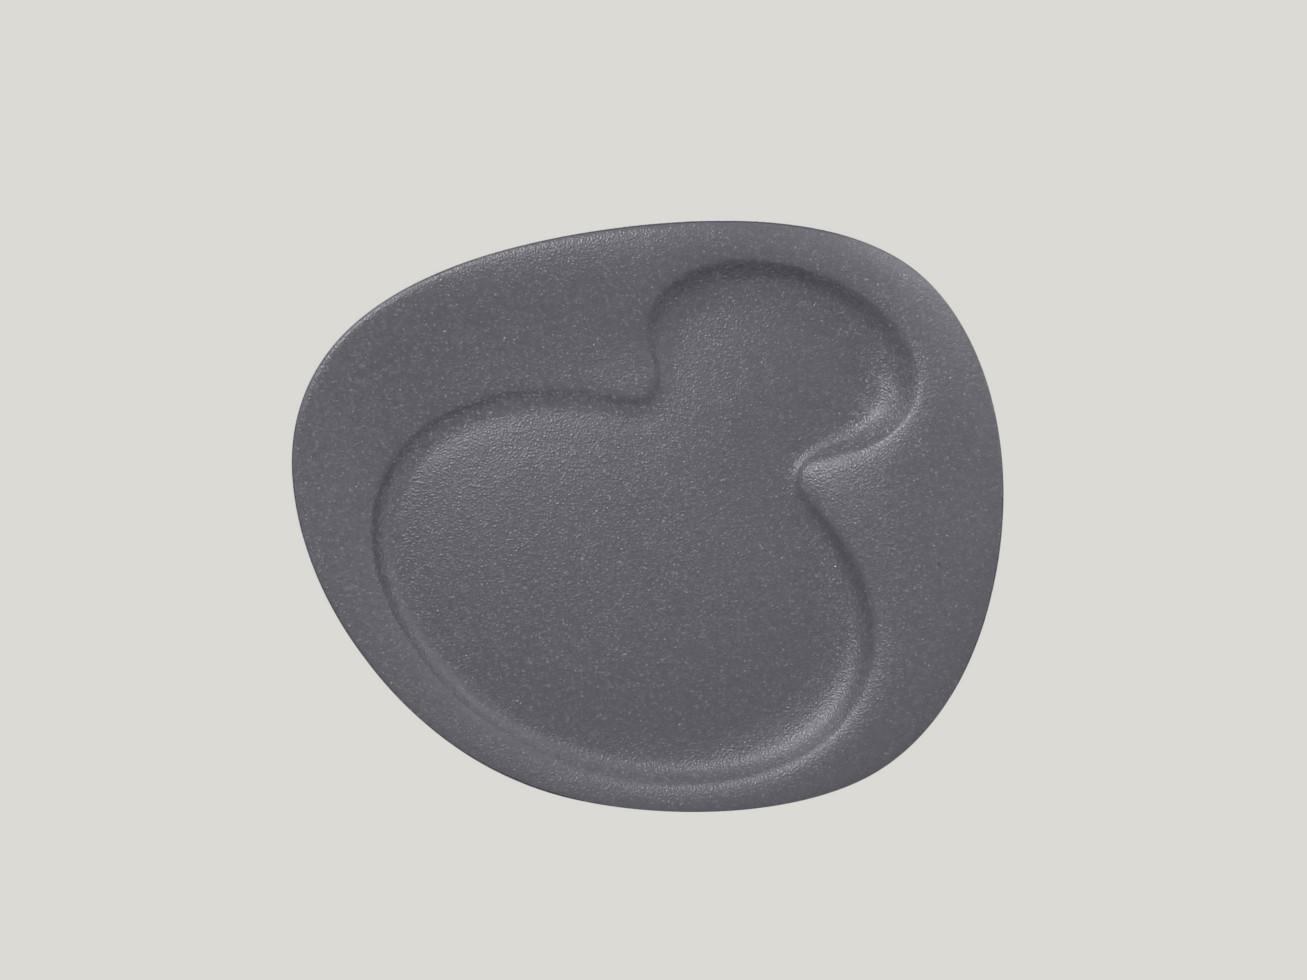 Breakfast talíř - 2 basins - šedá Neofusion